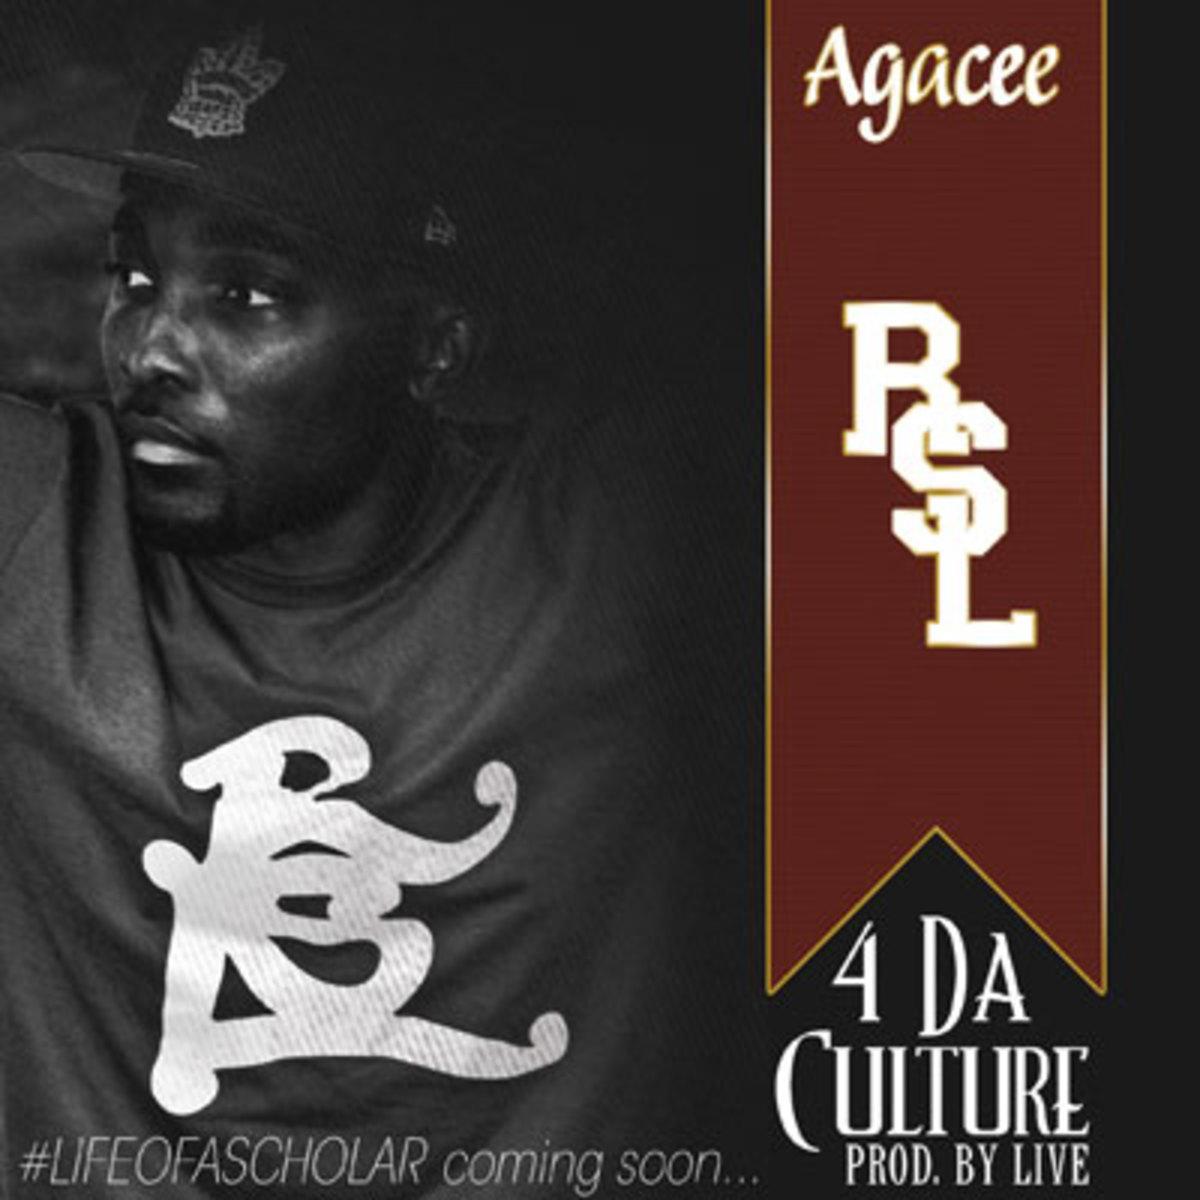 agacee-4daculture.jpg